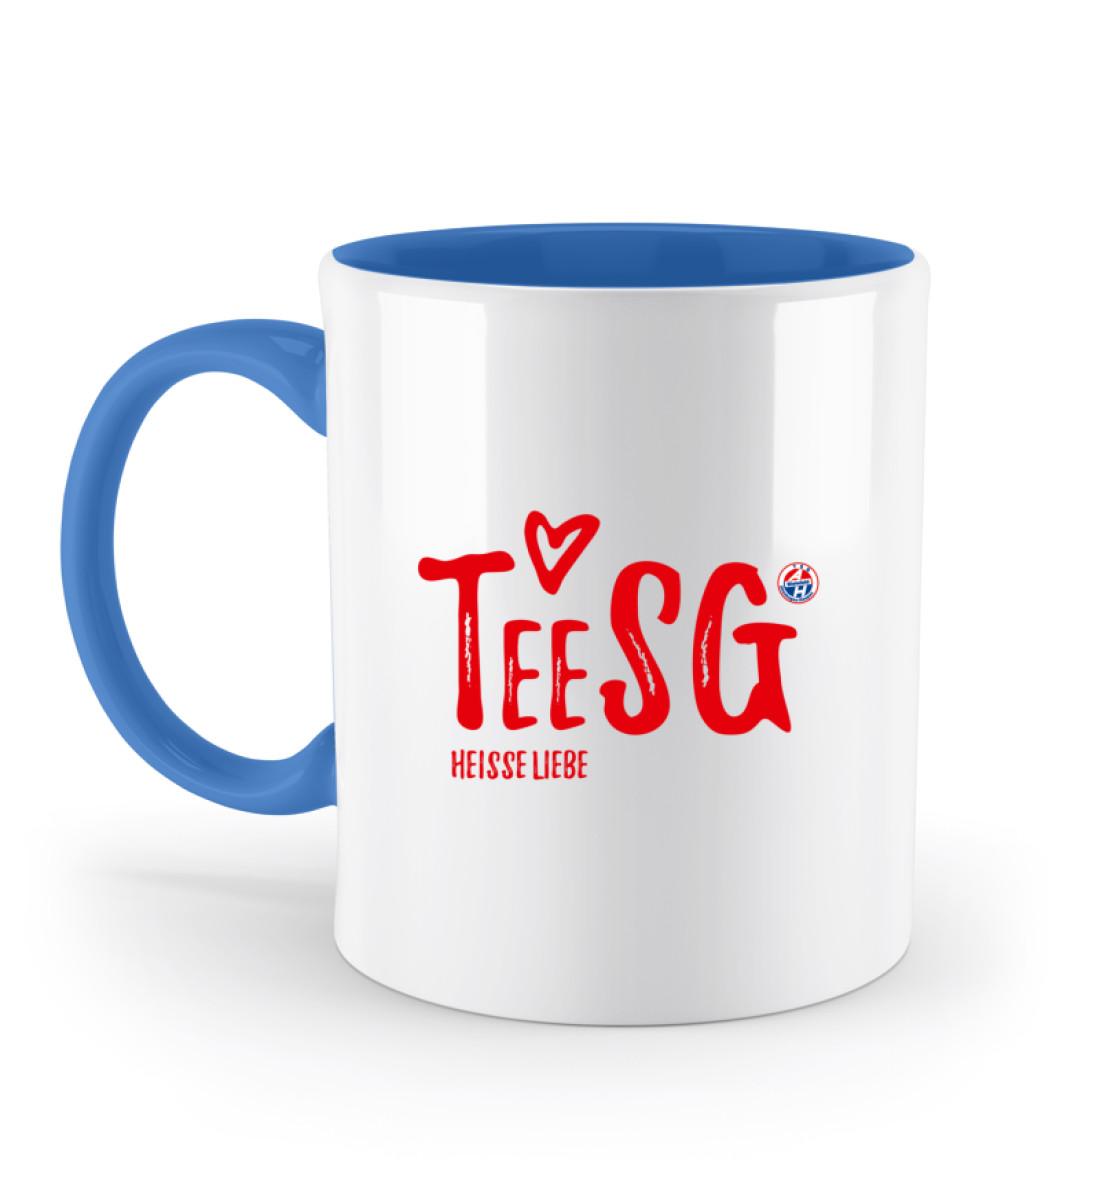 TeeSG - Zweifarbige Tasse-5739